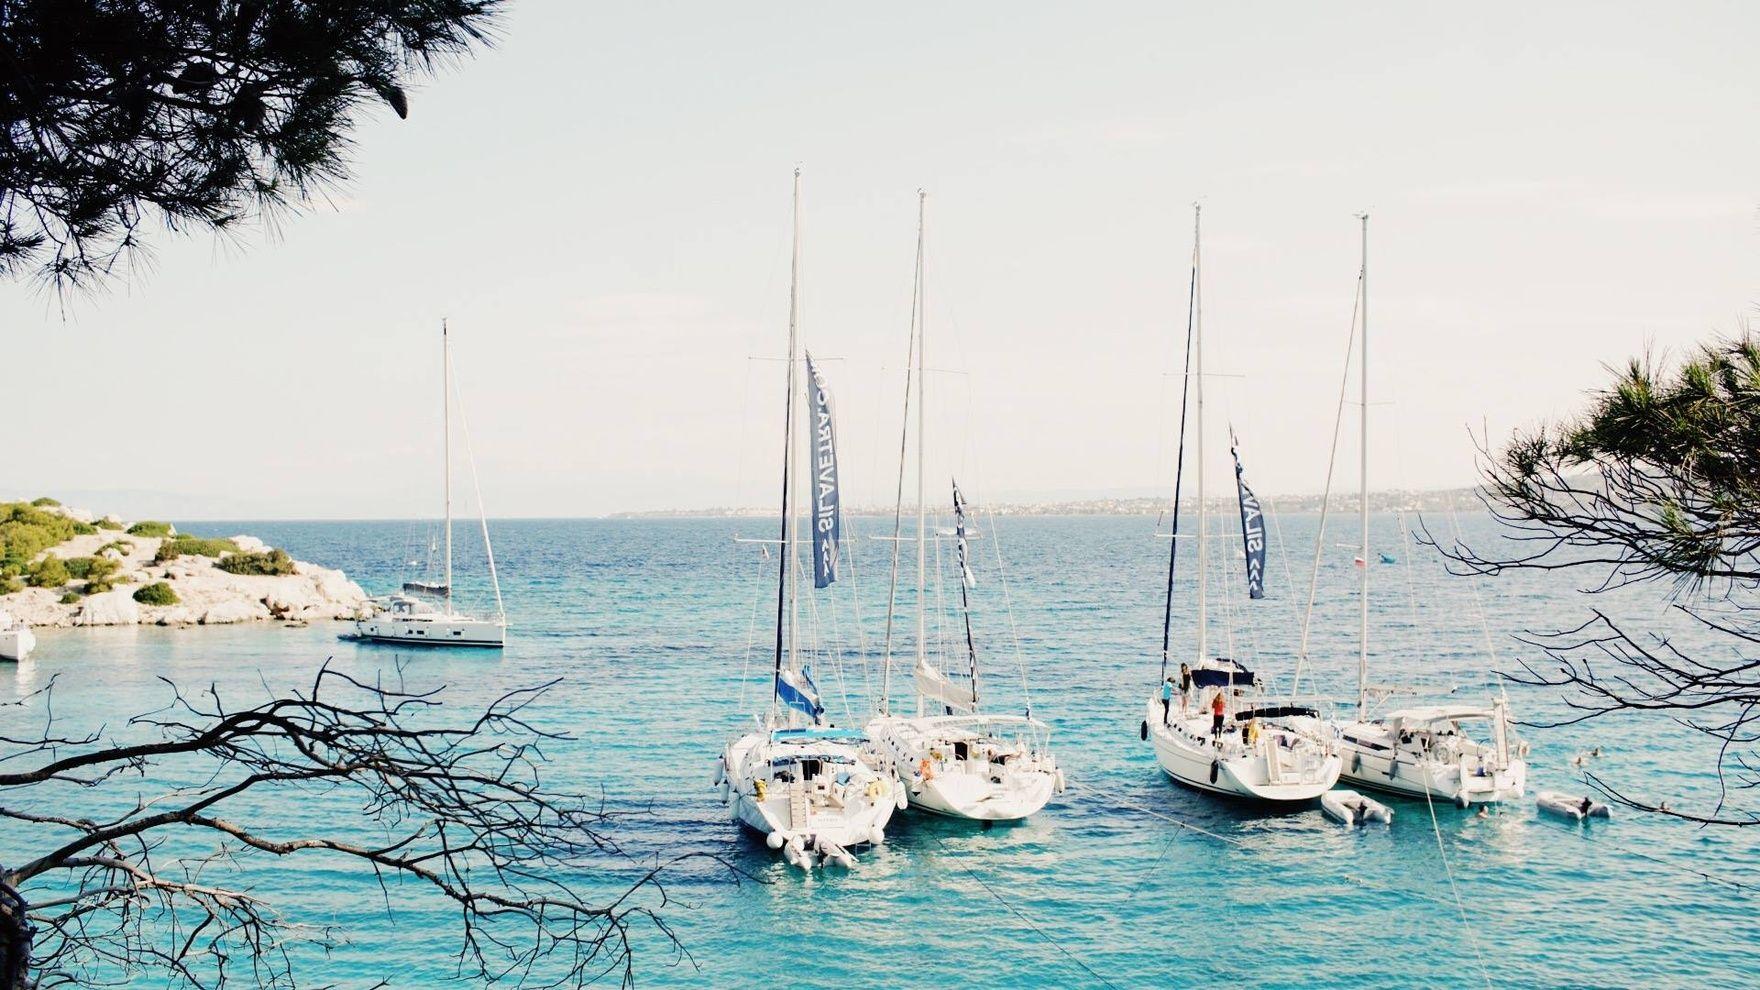 Training regatta in Greece